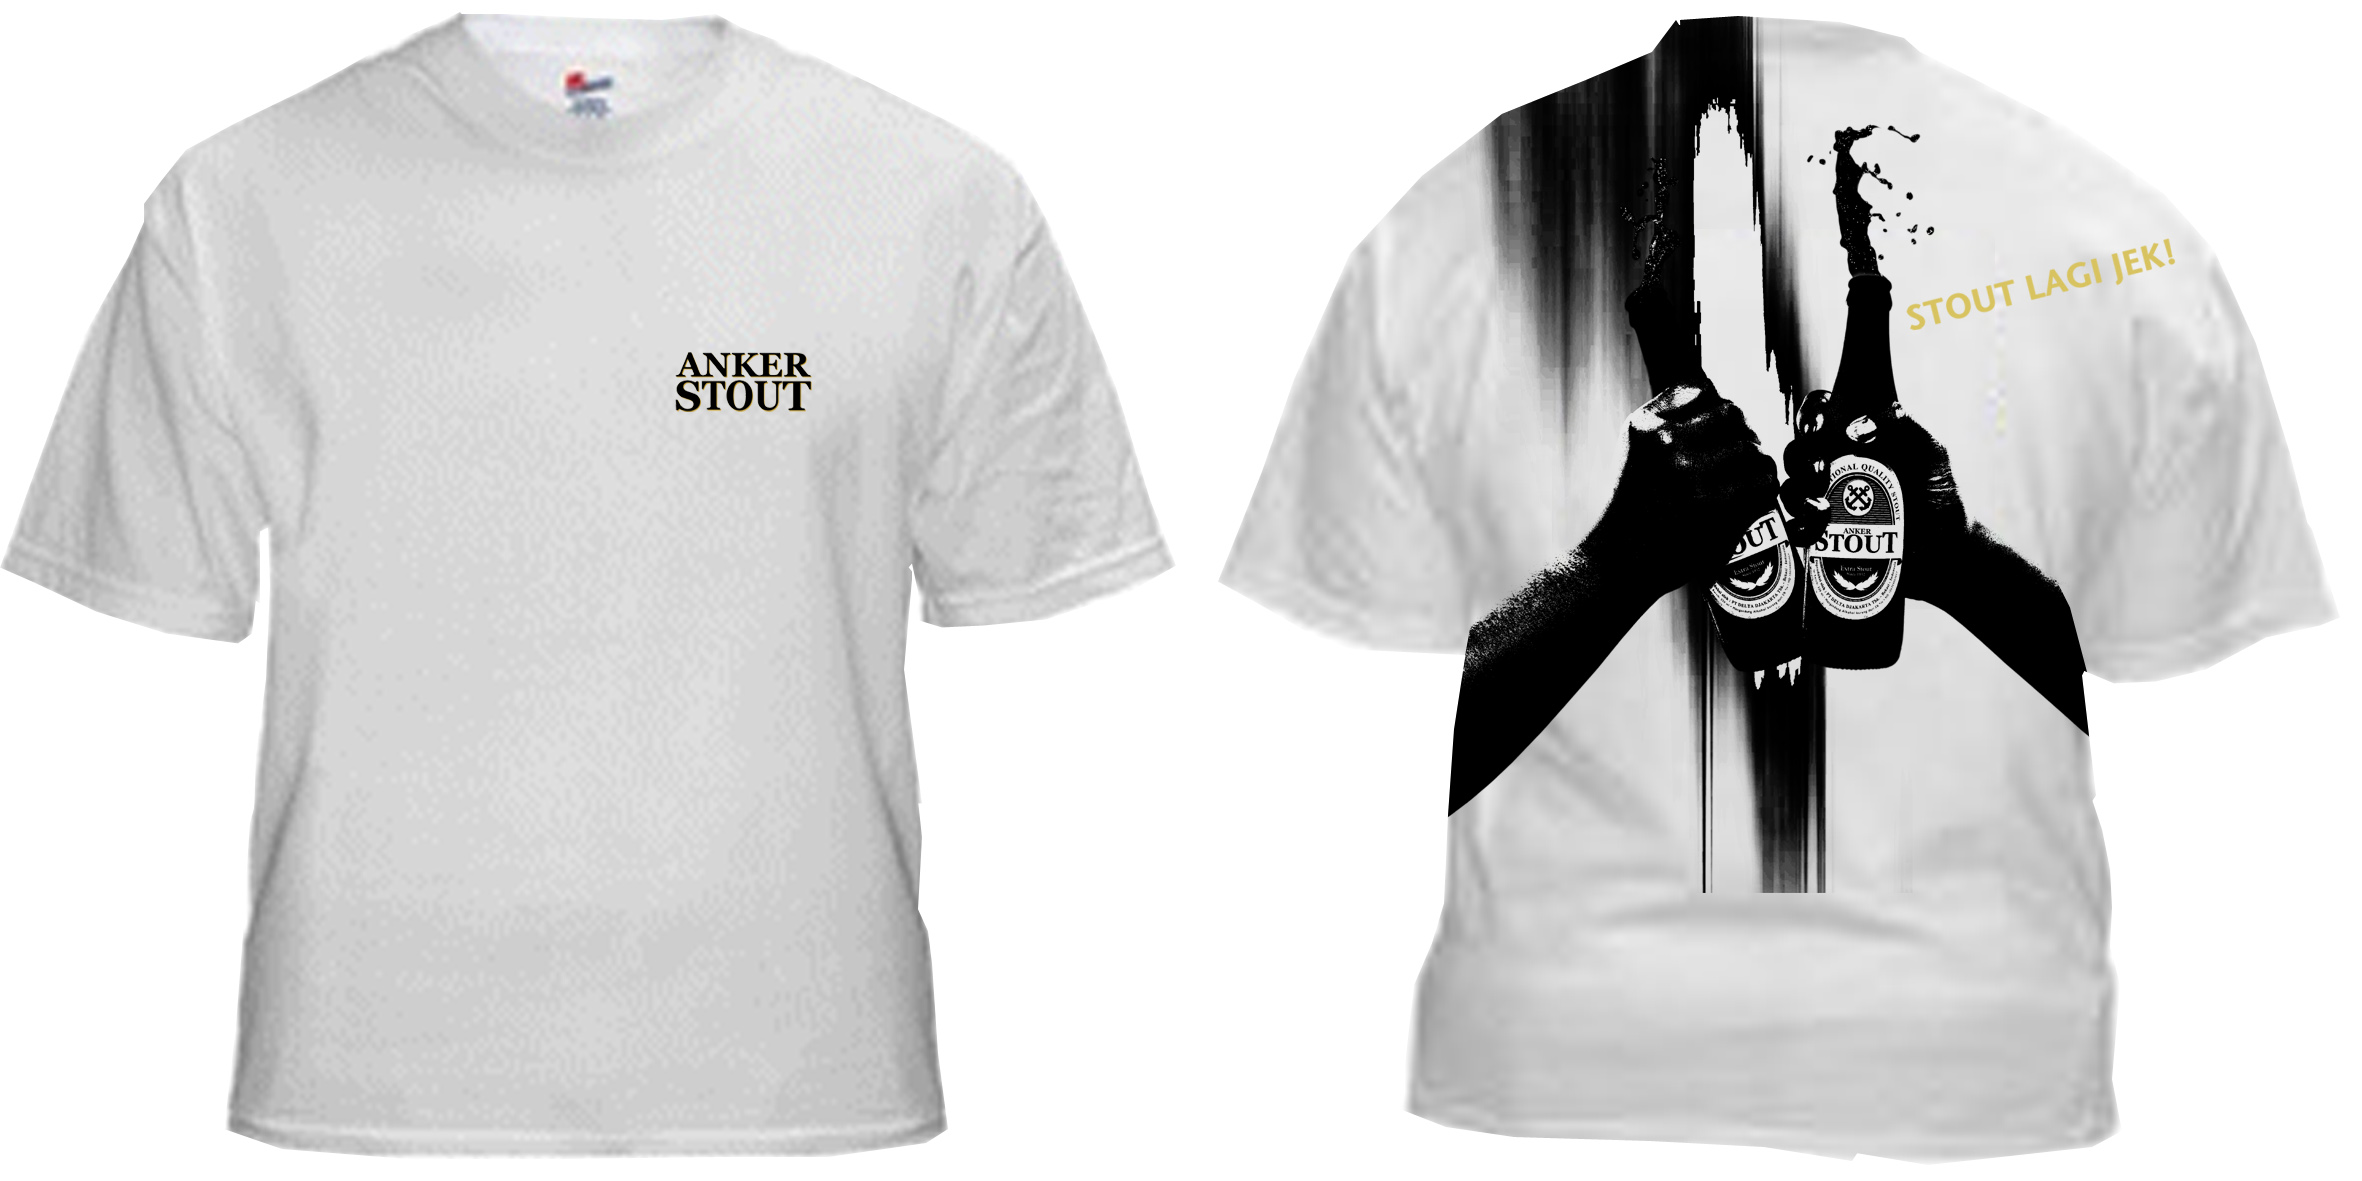 tshirt-putih-stoutsiluet-psd.jpg